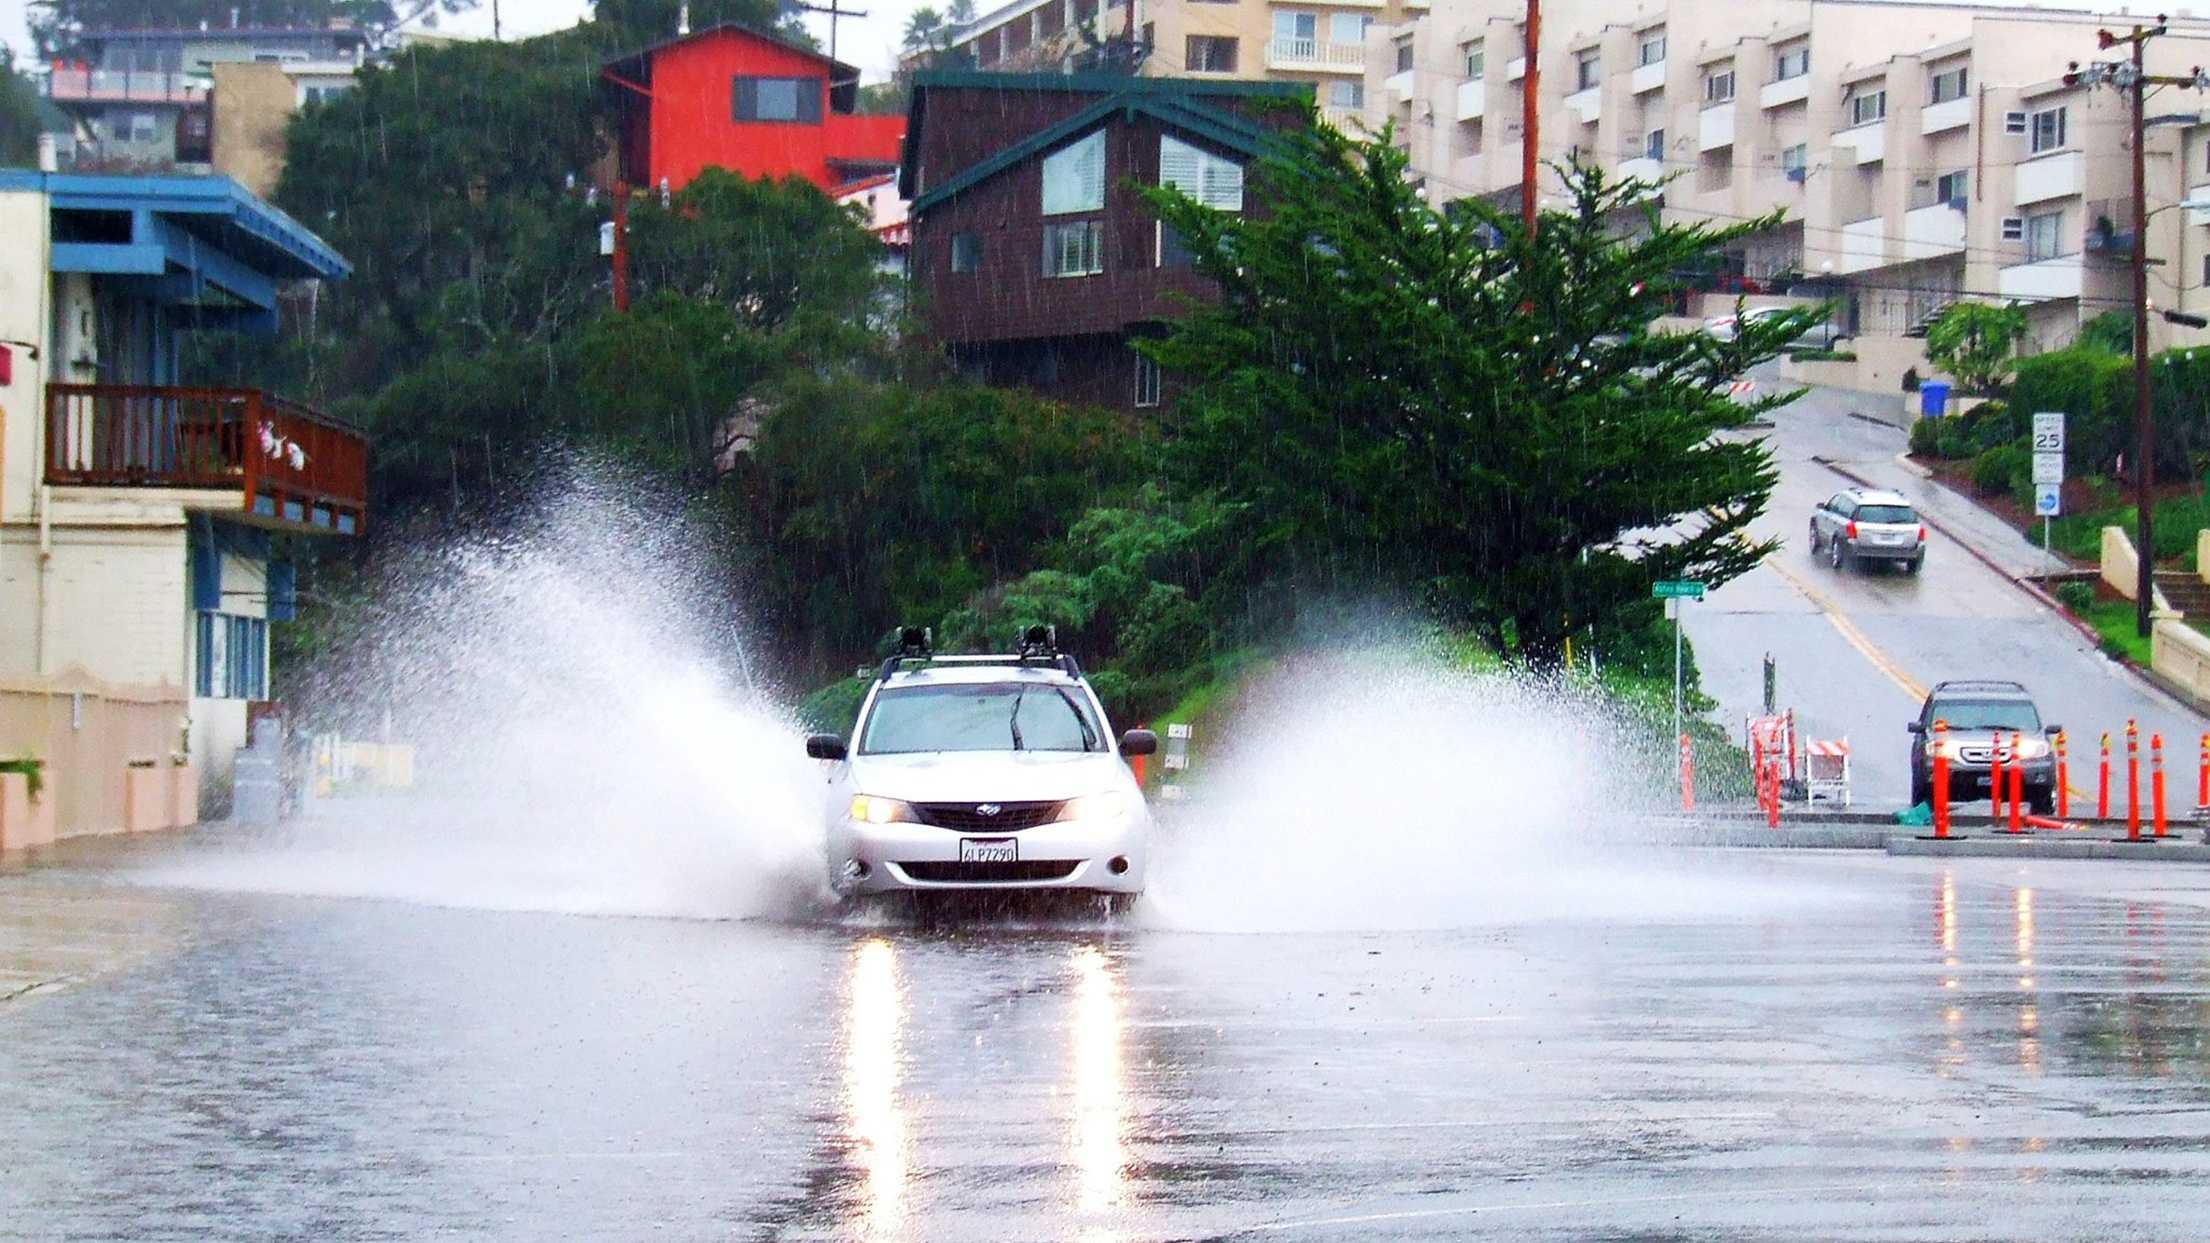 Rio Del Mar / Dec. 11, 2014